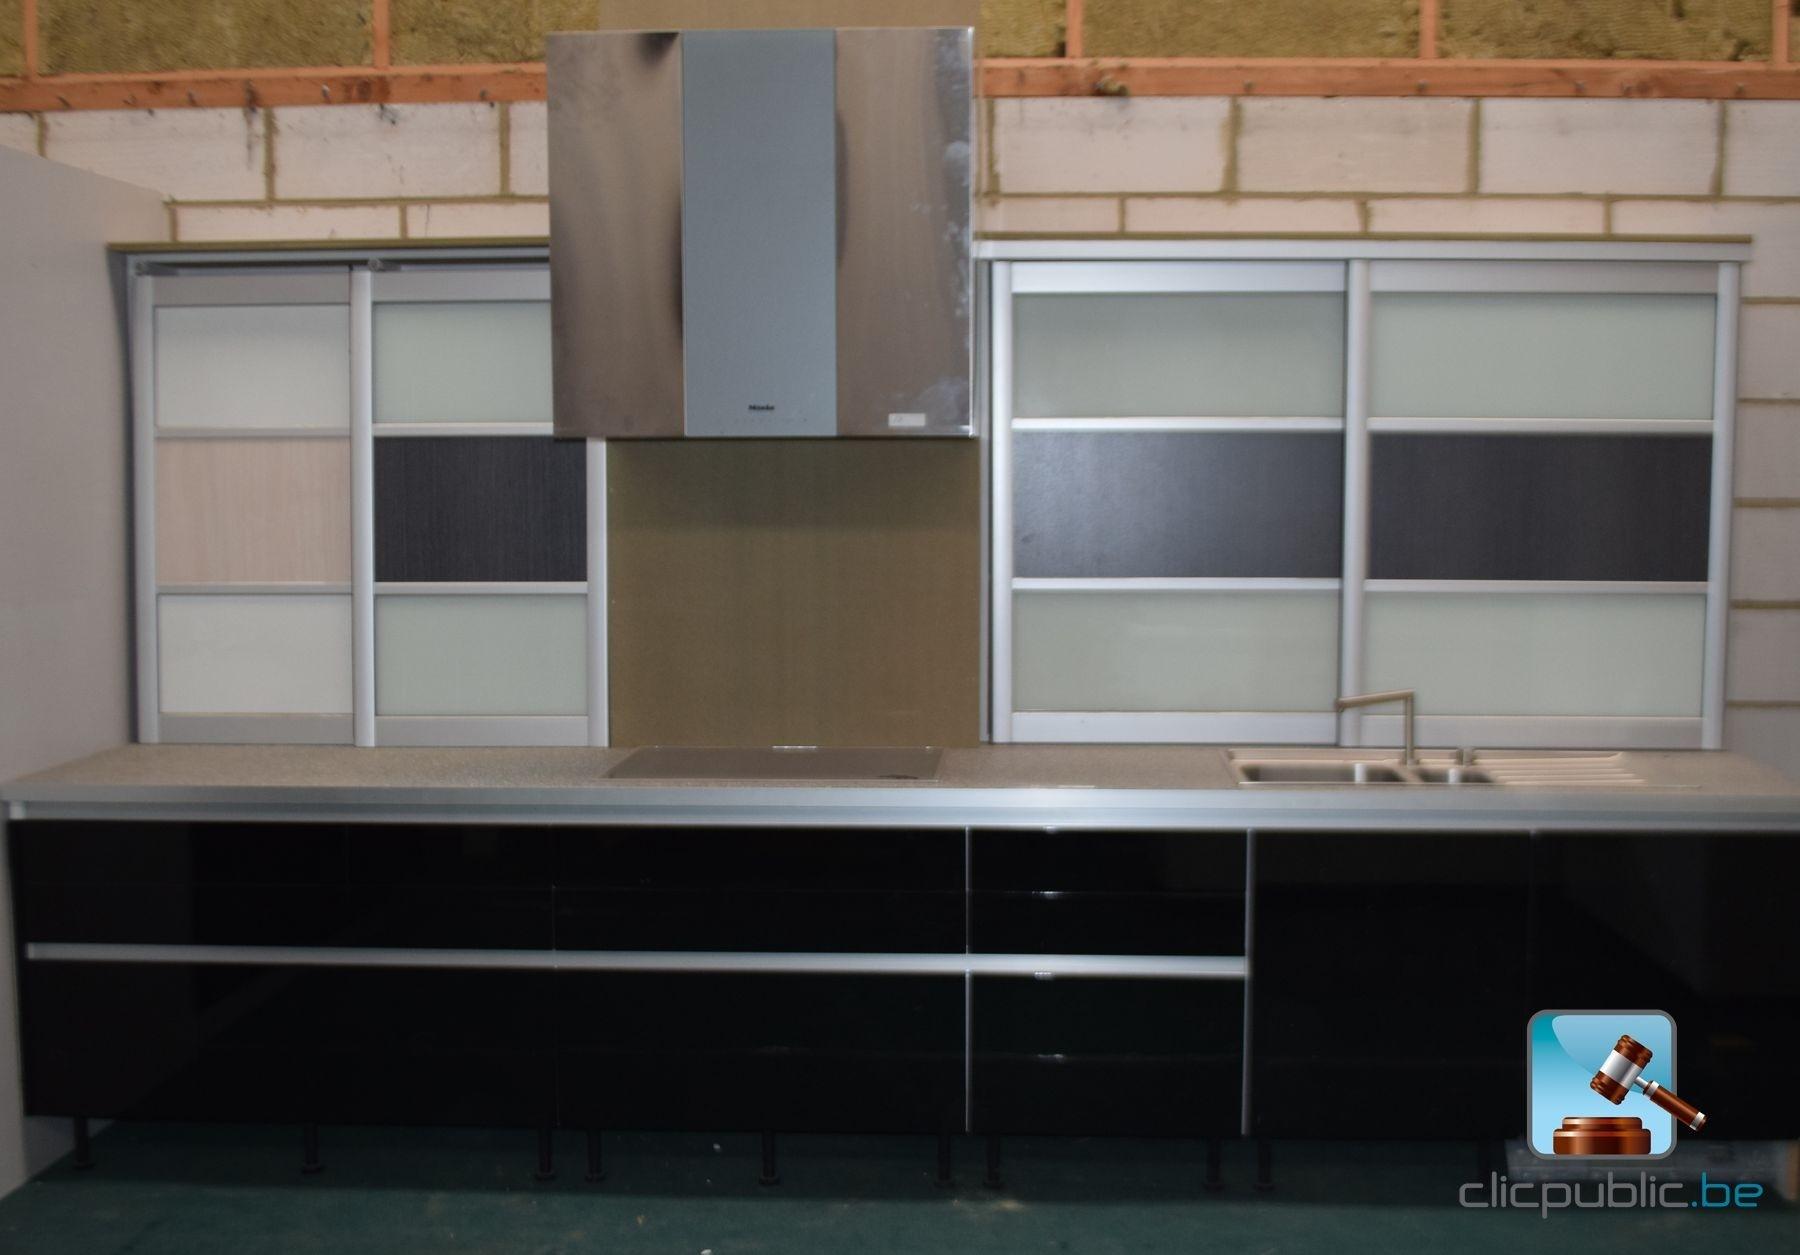 Keuken design laqu e noir aluminium et inox ref 68 te koop op - Keuken meuble noir ...